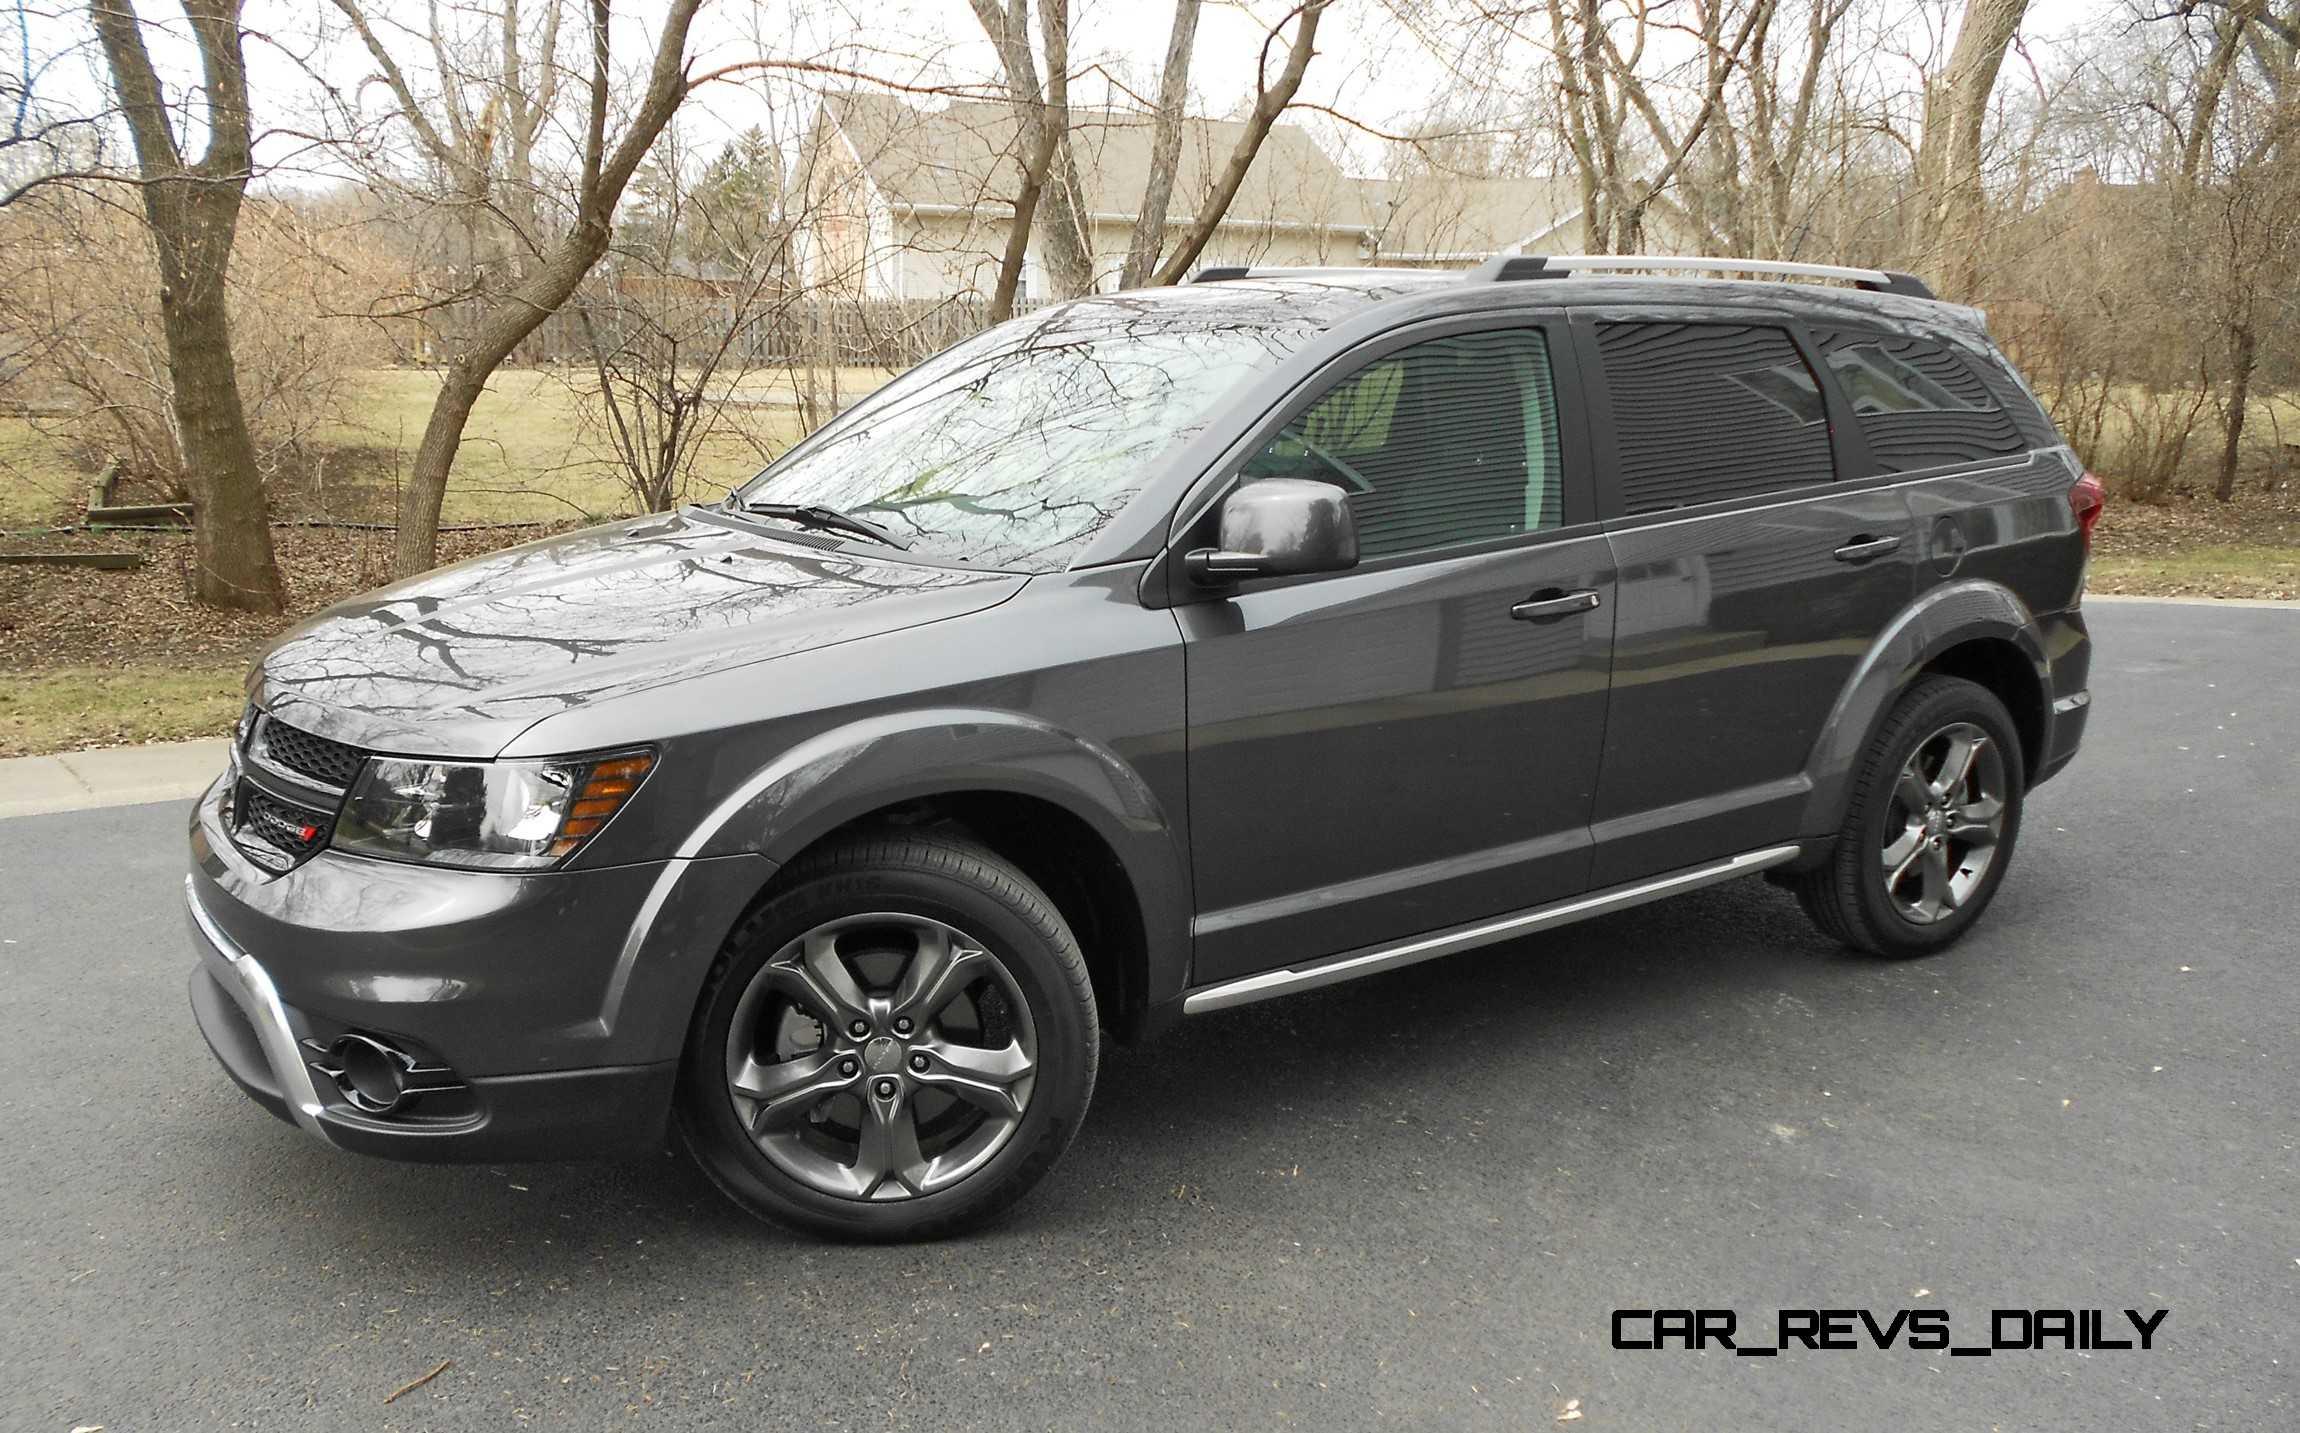 Dodge Journey Mpg >> 2015 Dodge Journey Crossroad AWD Review